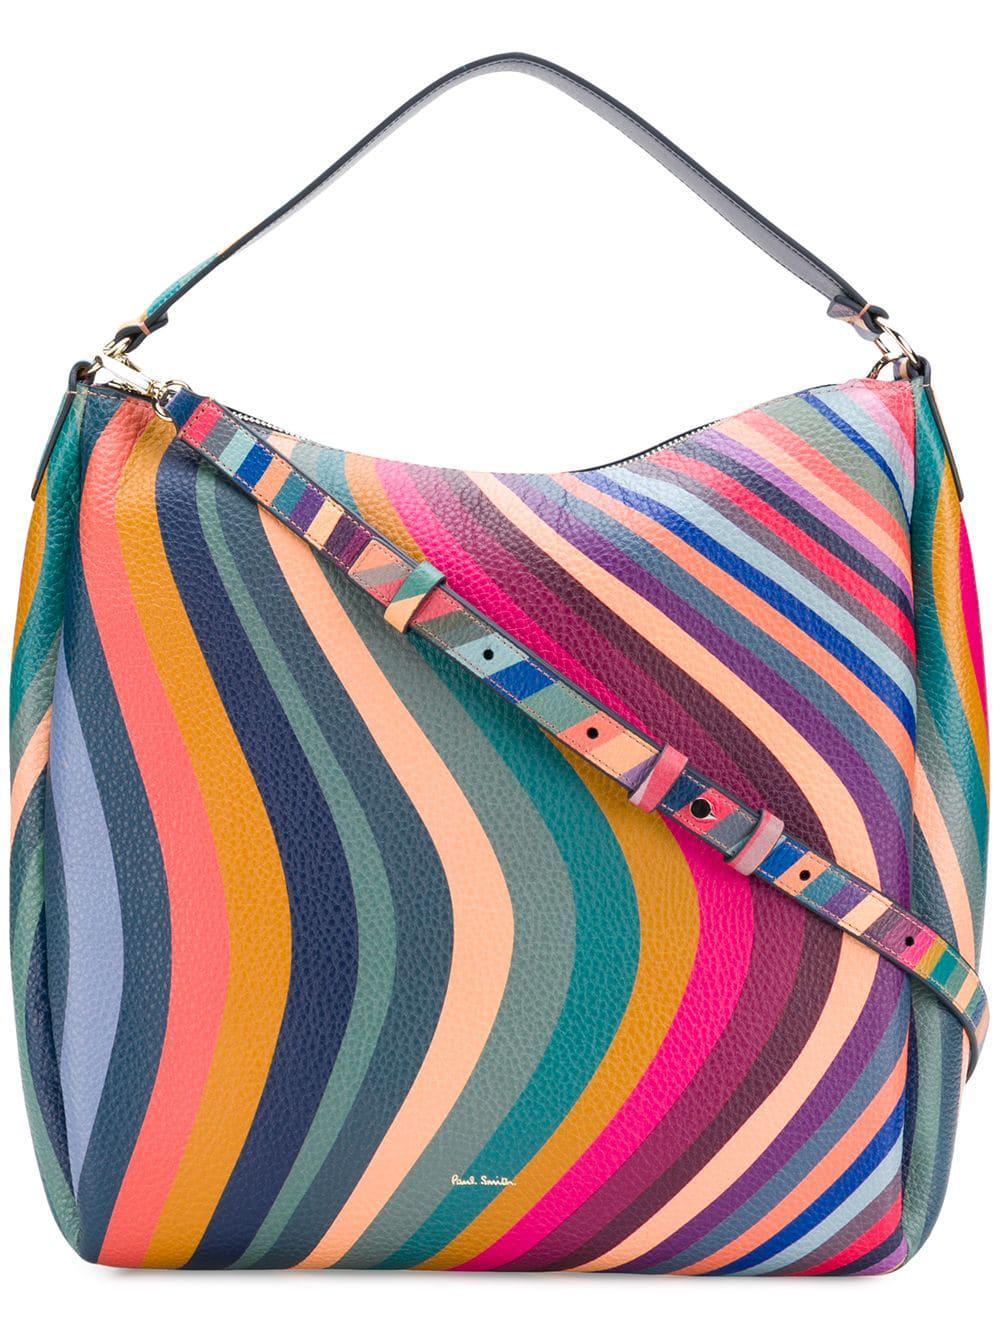 Paul Smith - Multicolor Swirl Zip Hobo Bag -  premium selection a3c0c 89e5d Paul  Smith - Multicolor Zip Hobo Bag - Lyst. bd15278037fd4